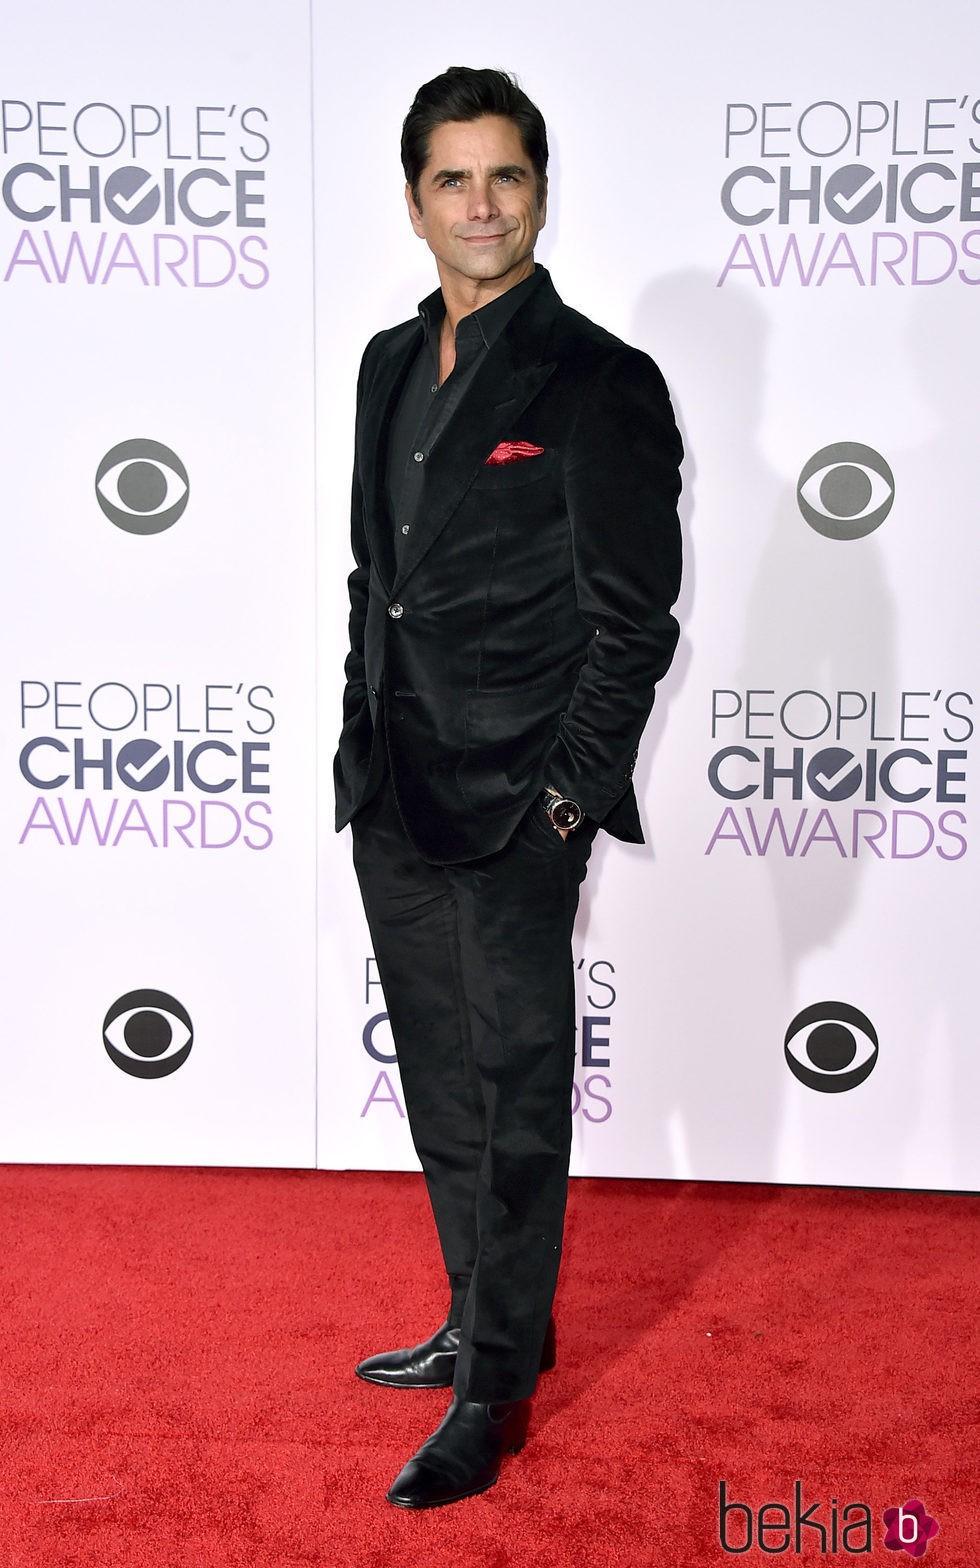 John Stamos en los People's Choice Awards 2016